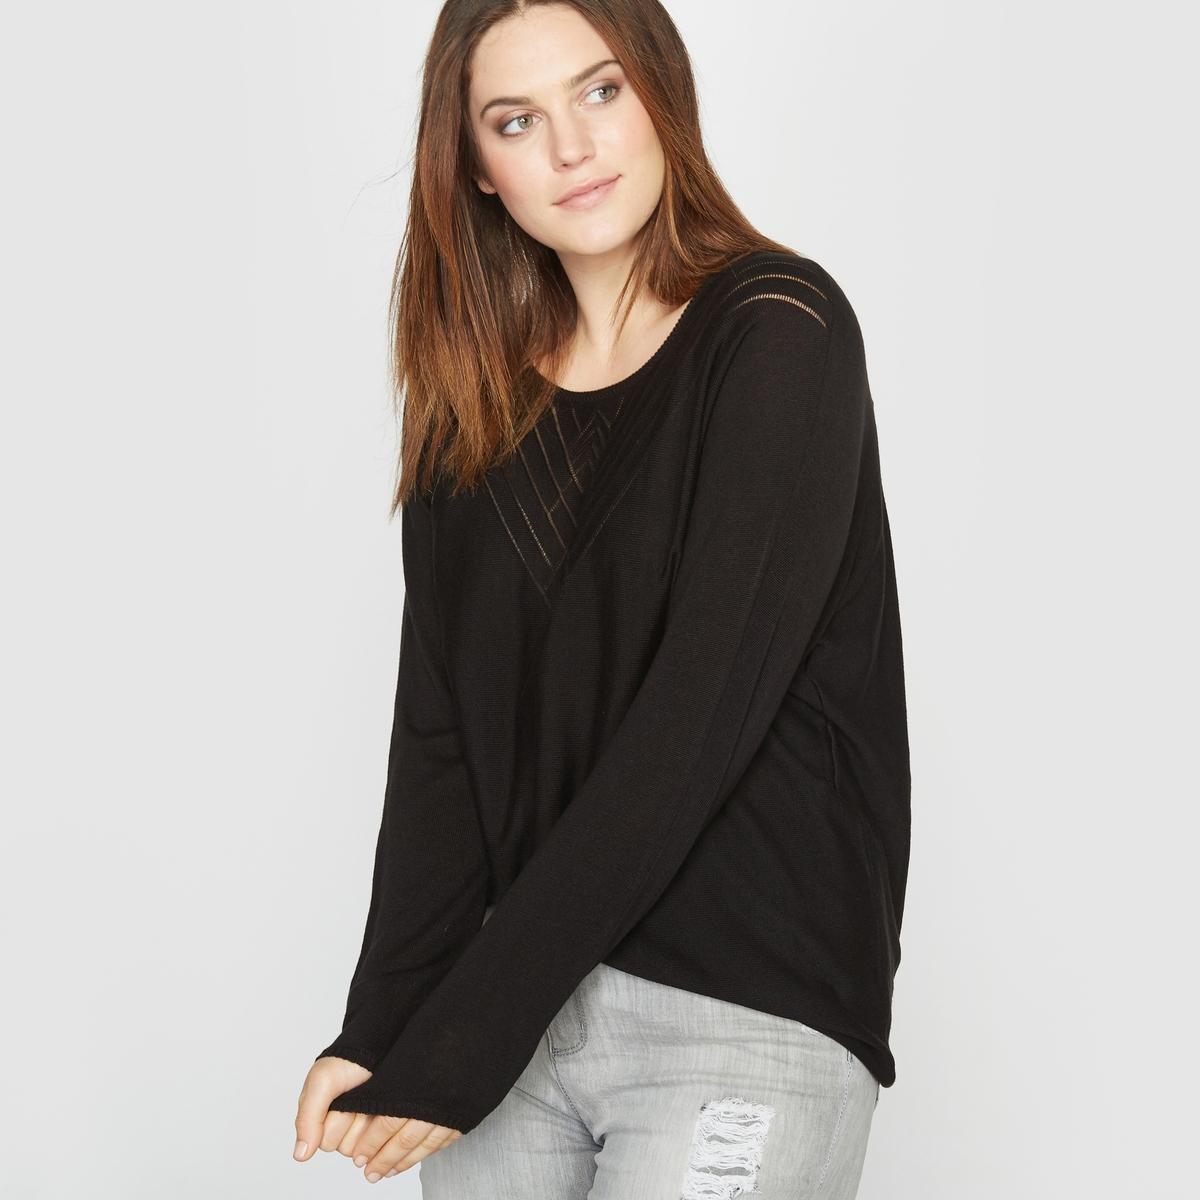 Пуловер с круглым вырезом, ажурная вязка.